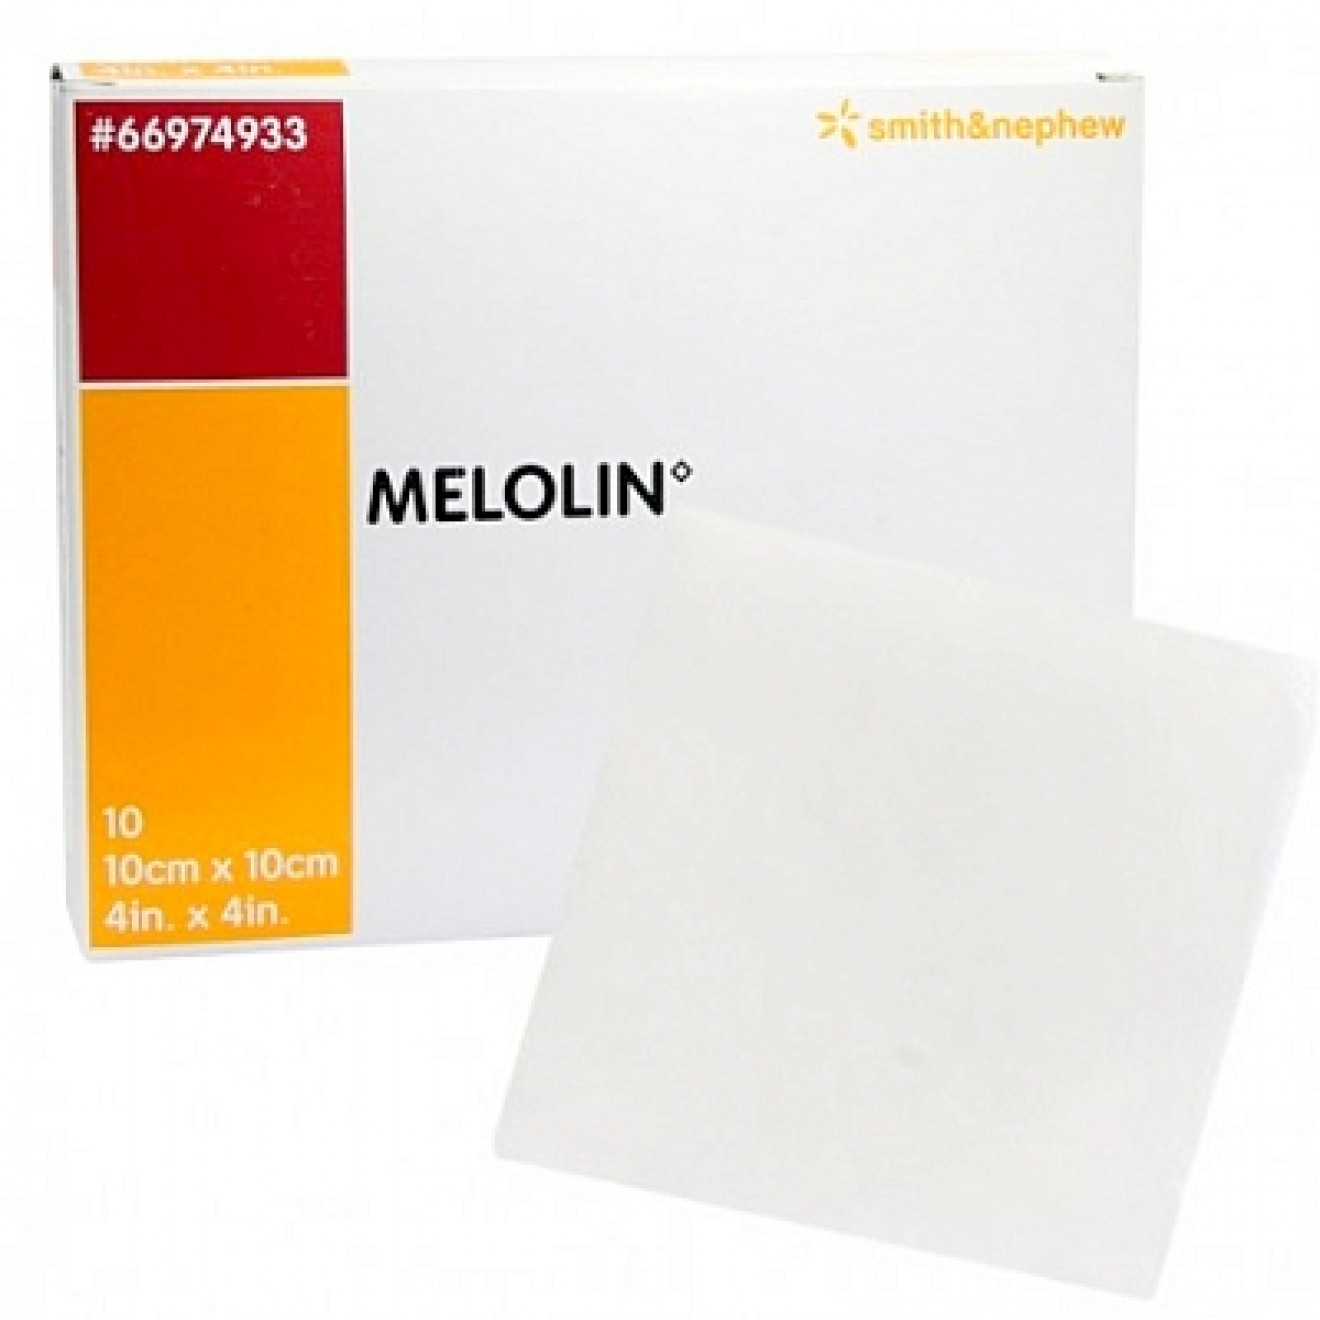 Smith Nephew GmbH MELOLIN 10x10 cm Wundauflagen steril 10 ST 03170748